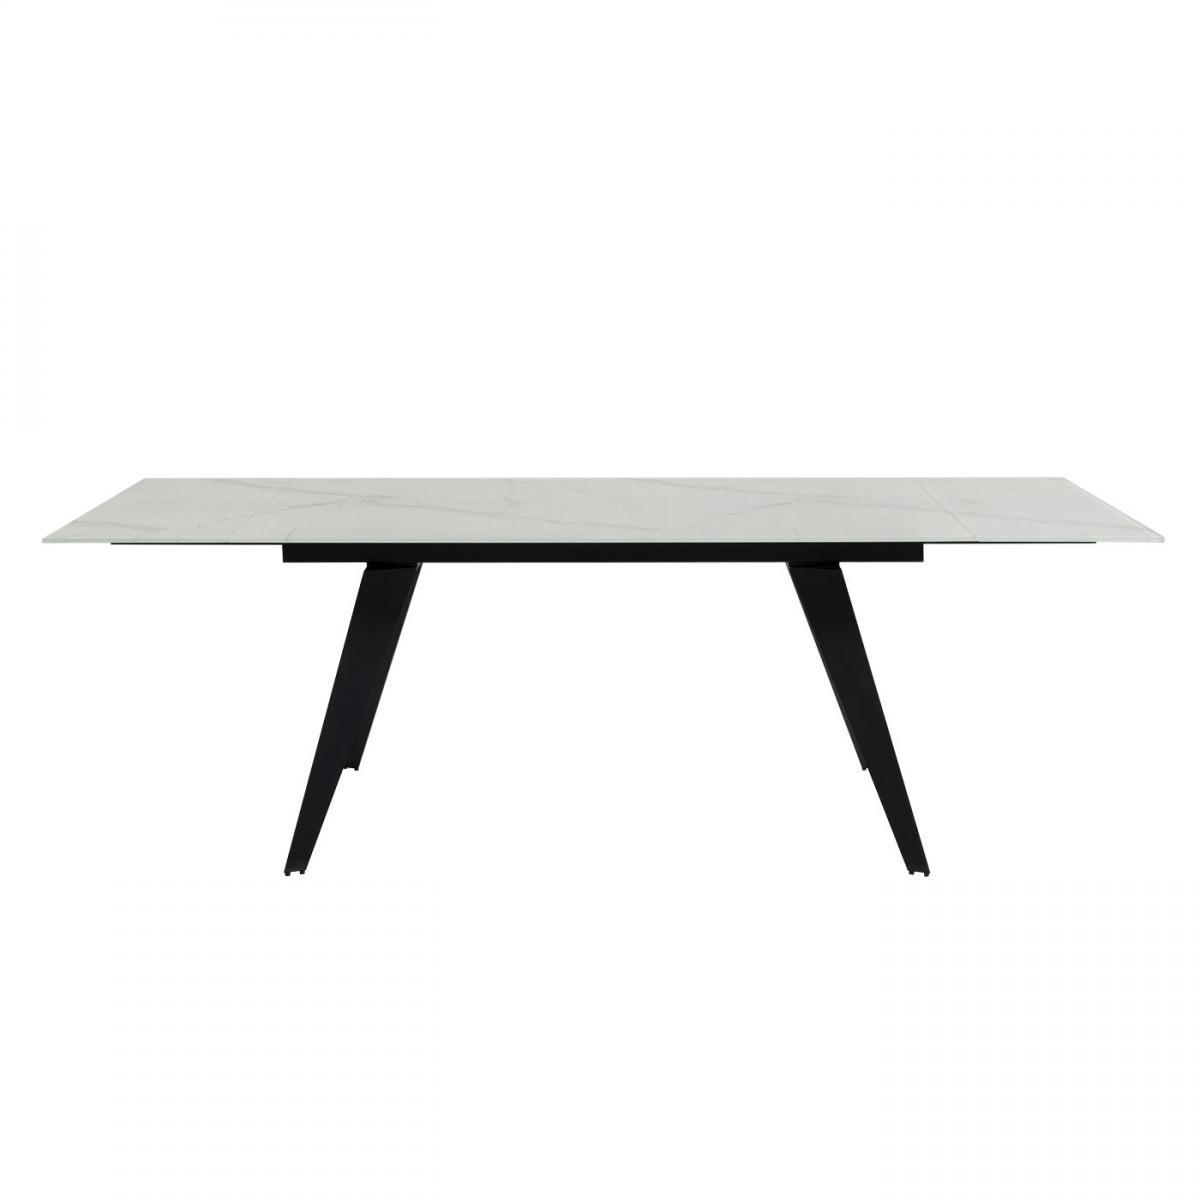 Karedesign Table à rallonges Amsterdam 160x90cm effet marbre blanc Kare Design